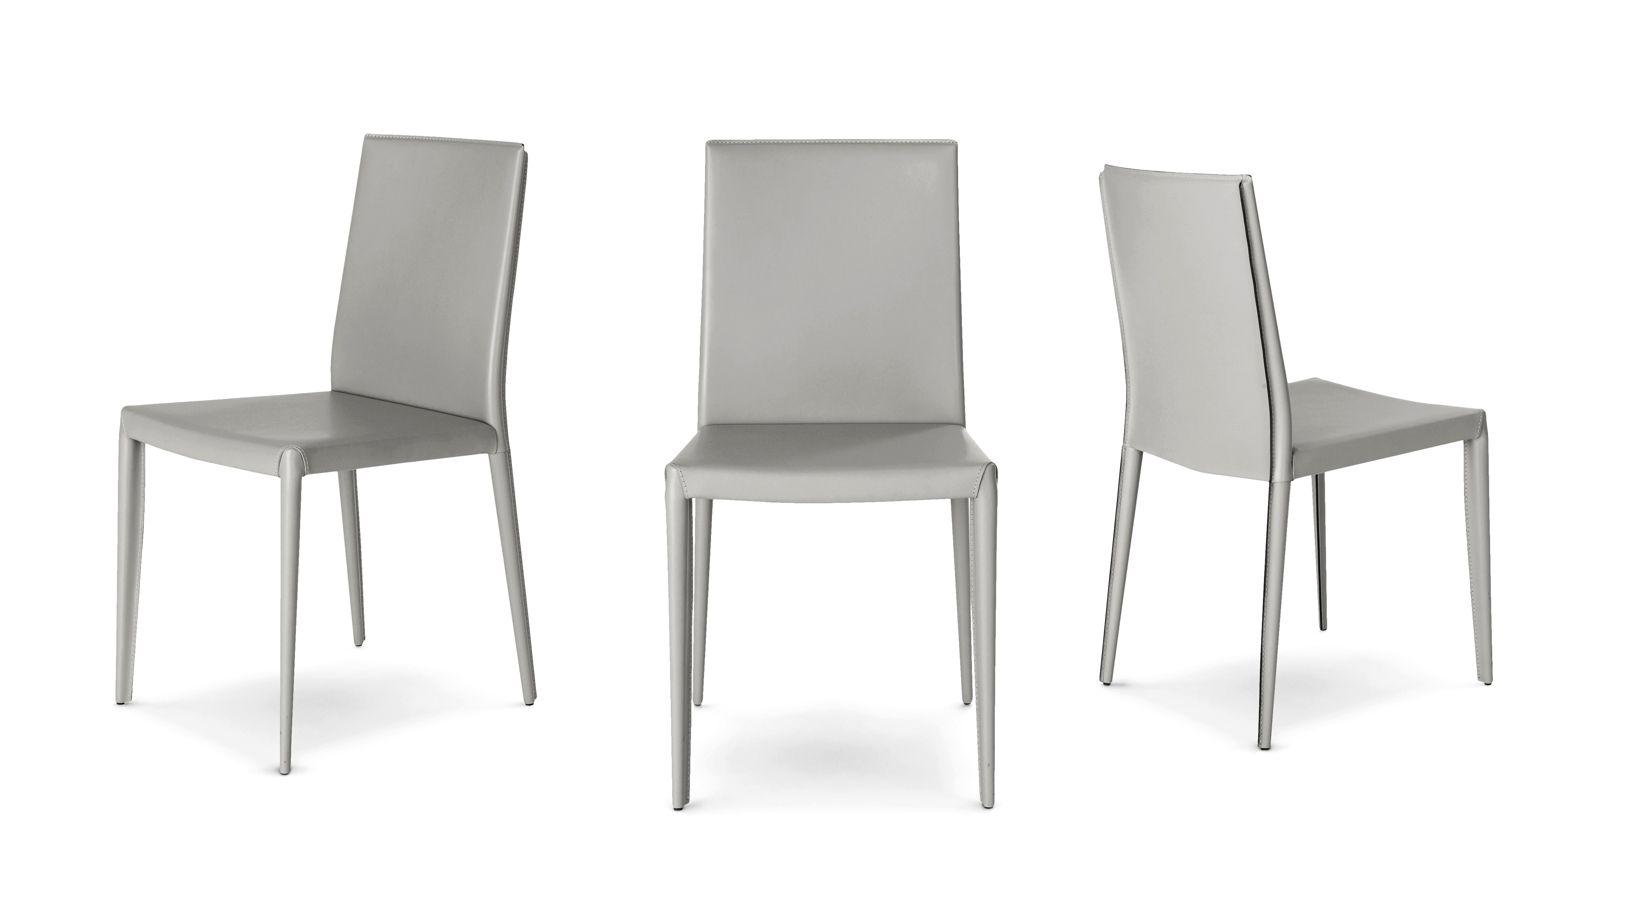 table de repas diapo roche bobois. Black Bedroom Furniture Sets. Home Design Ideas